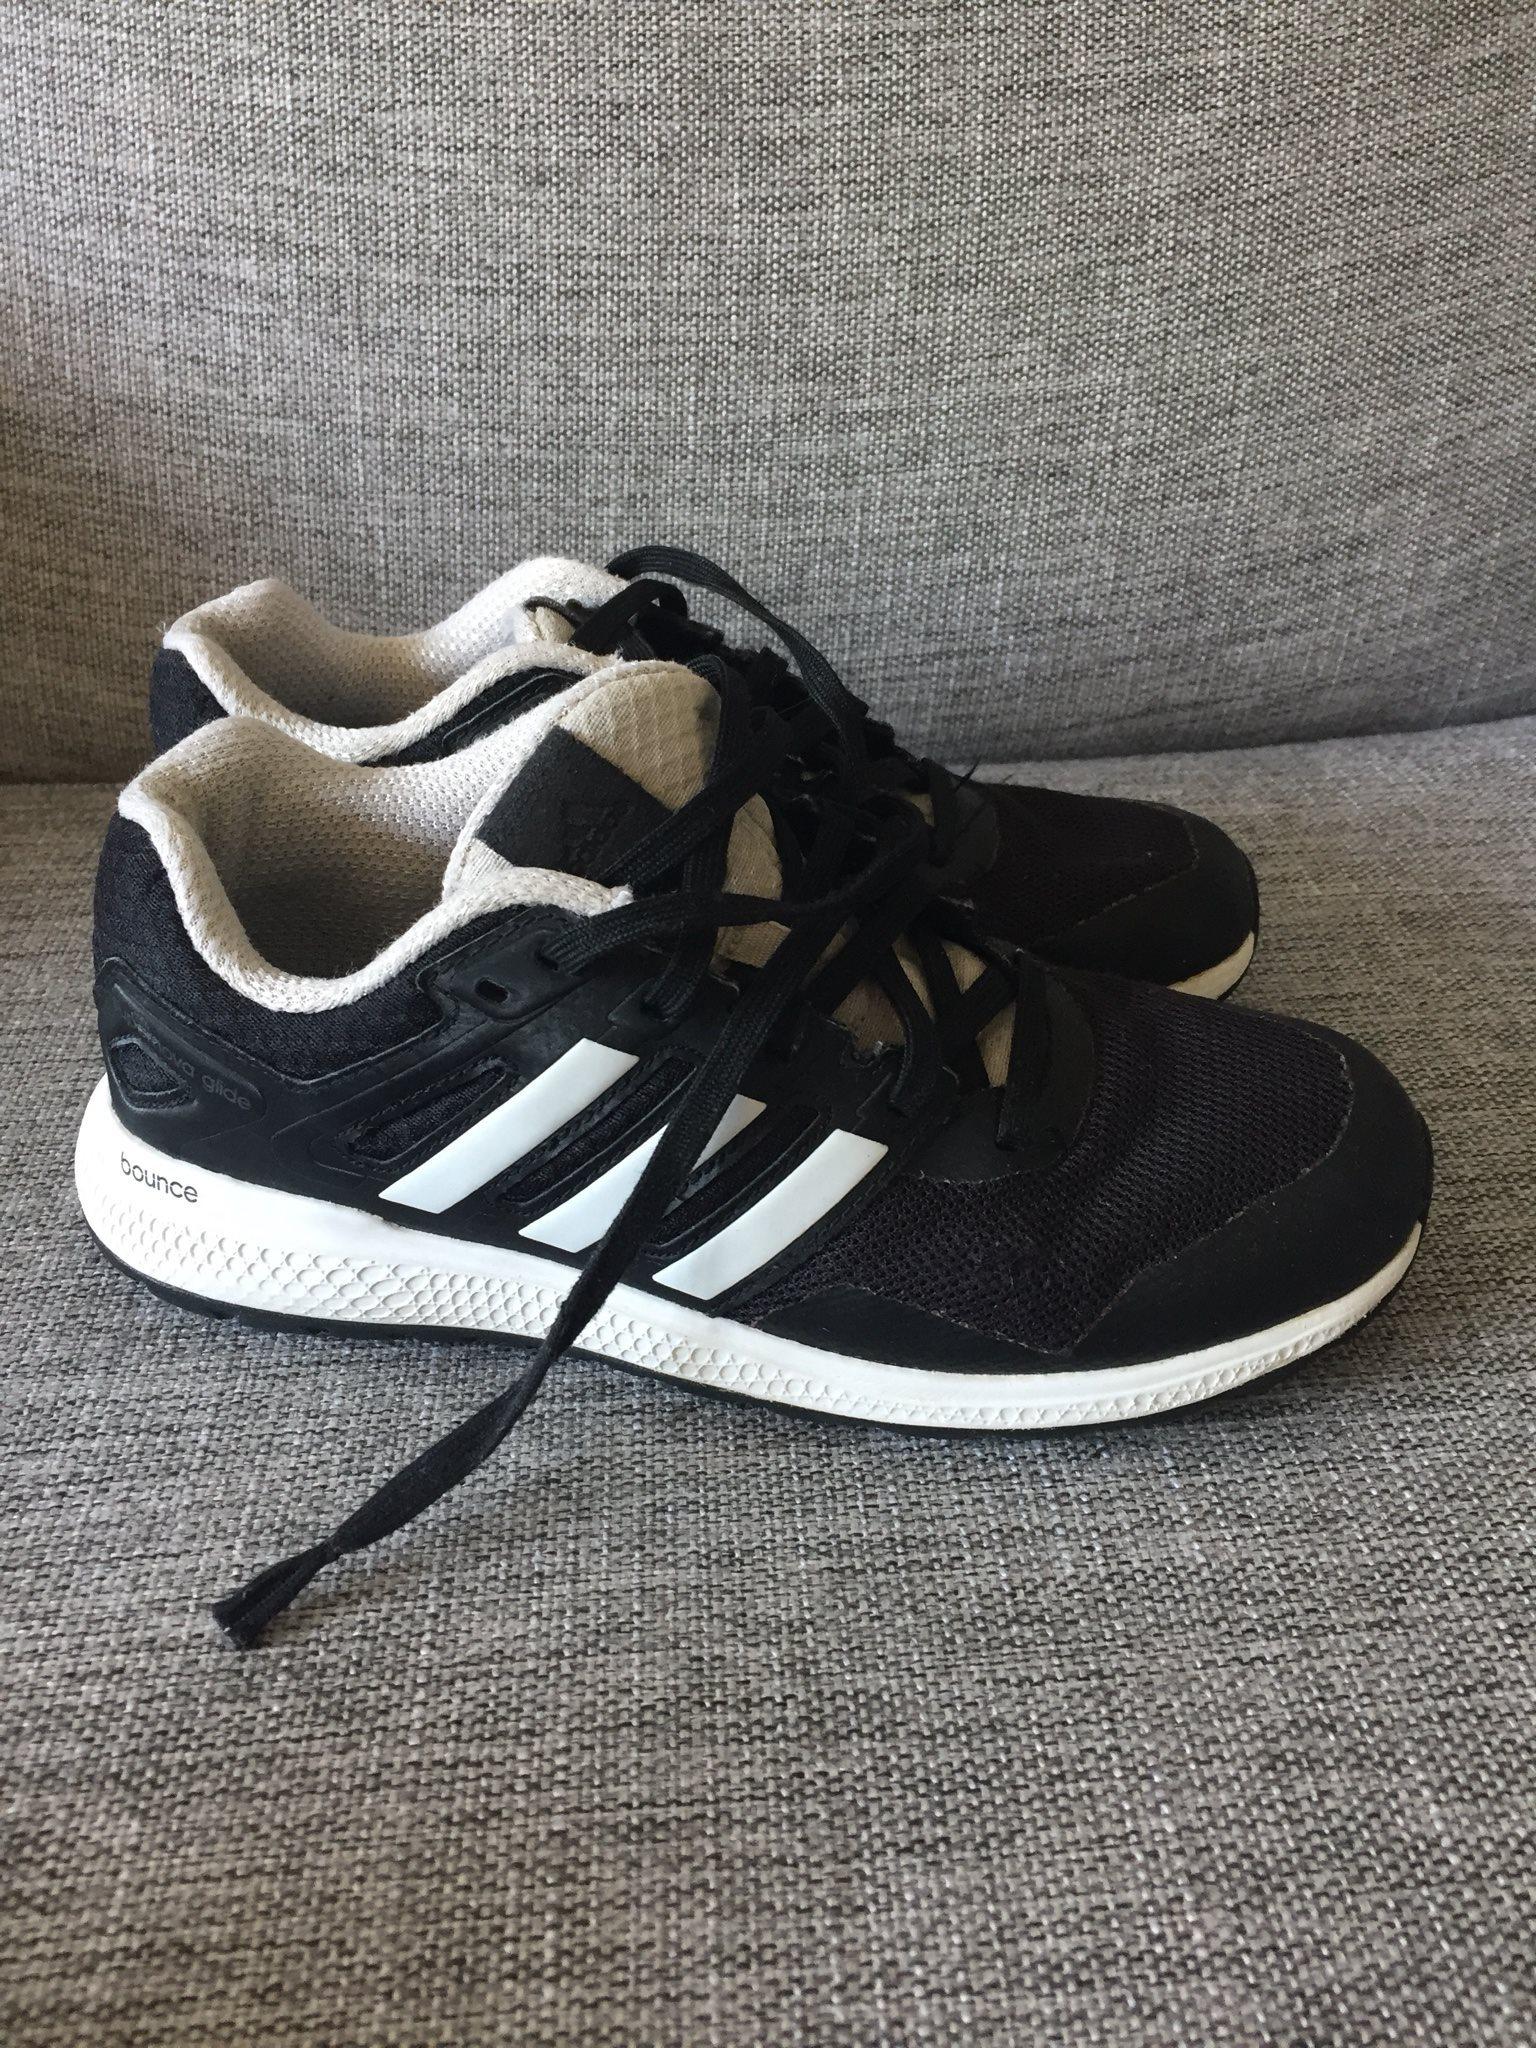 new product 6849c ba51e skor Adidas 312818672 sköna gympa Snygga sneakers 34 stl PtqAxnBwa